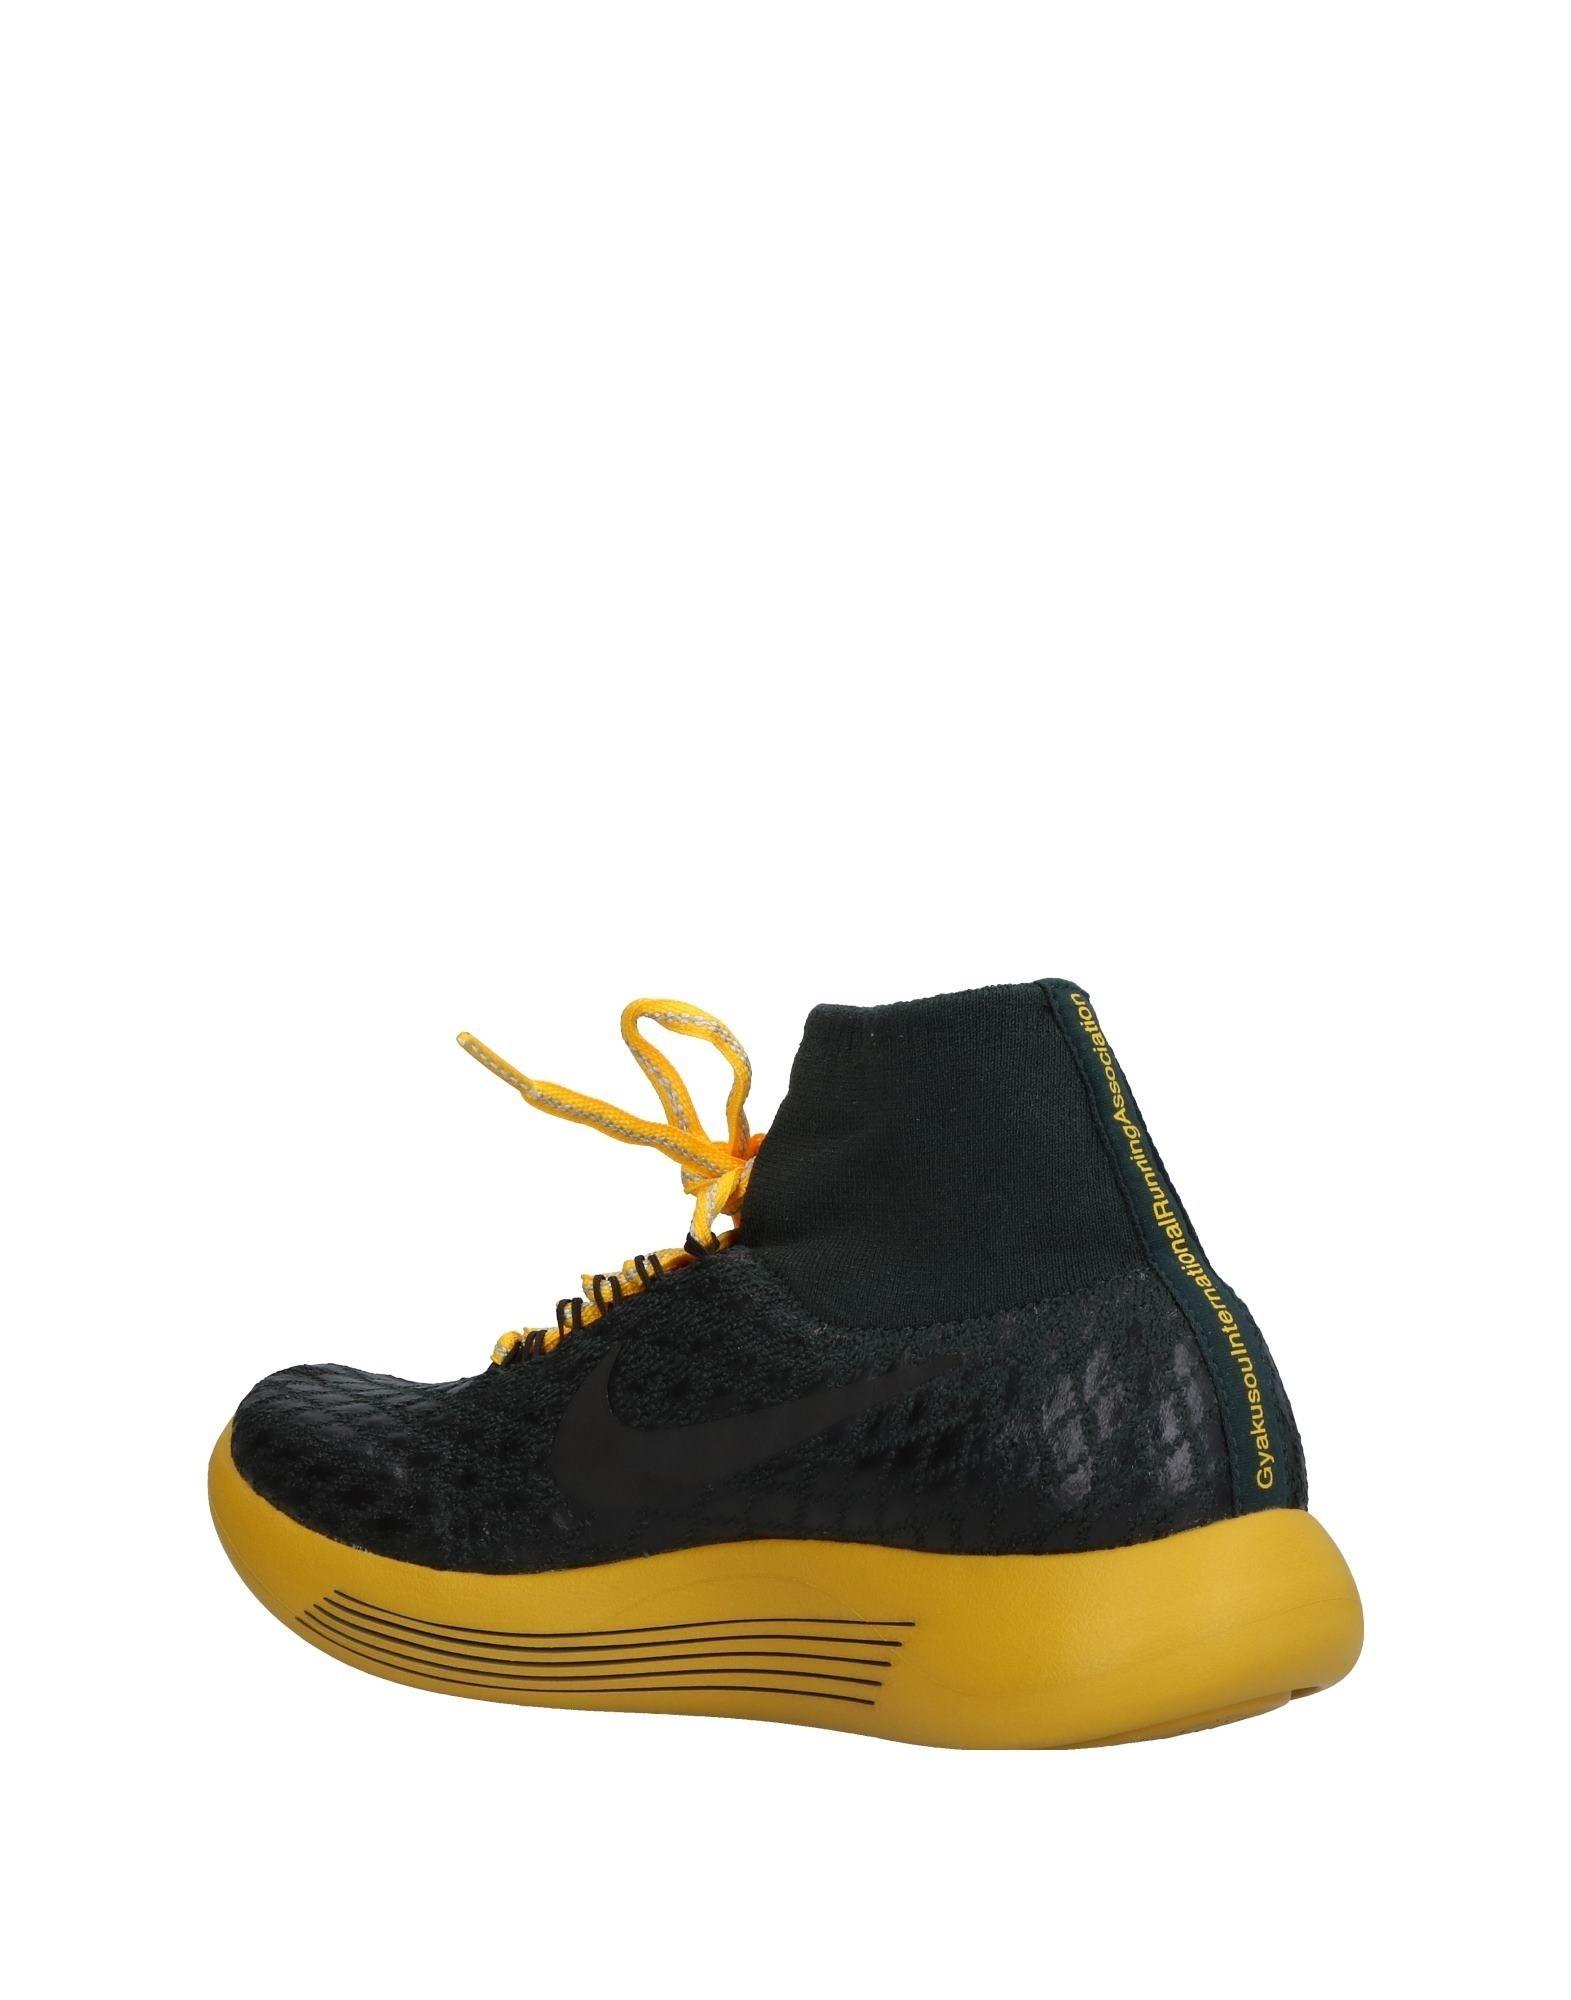 Nike Sneakers - Women Women Women Nike Sneakers online on  United Kingdom - 11316494PC 71869b